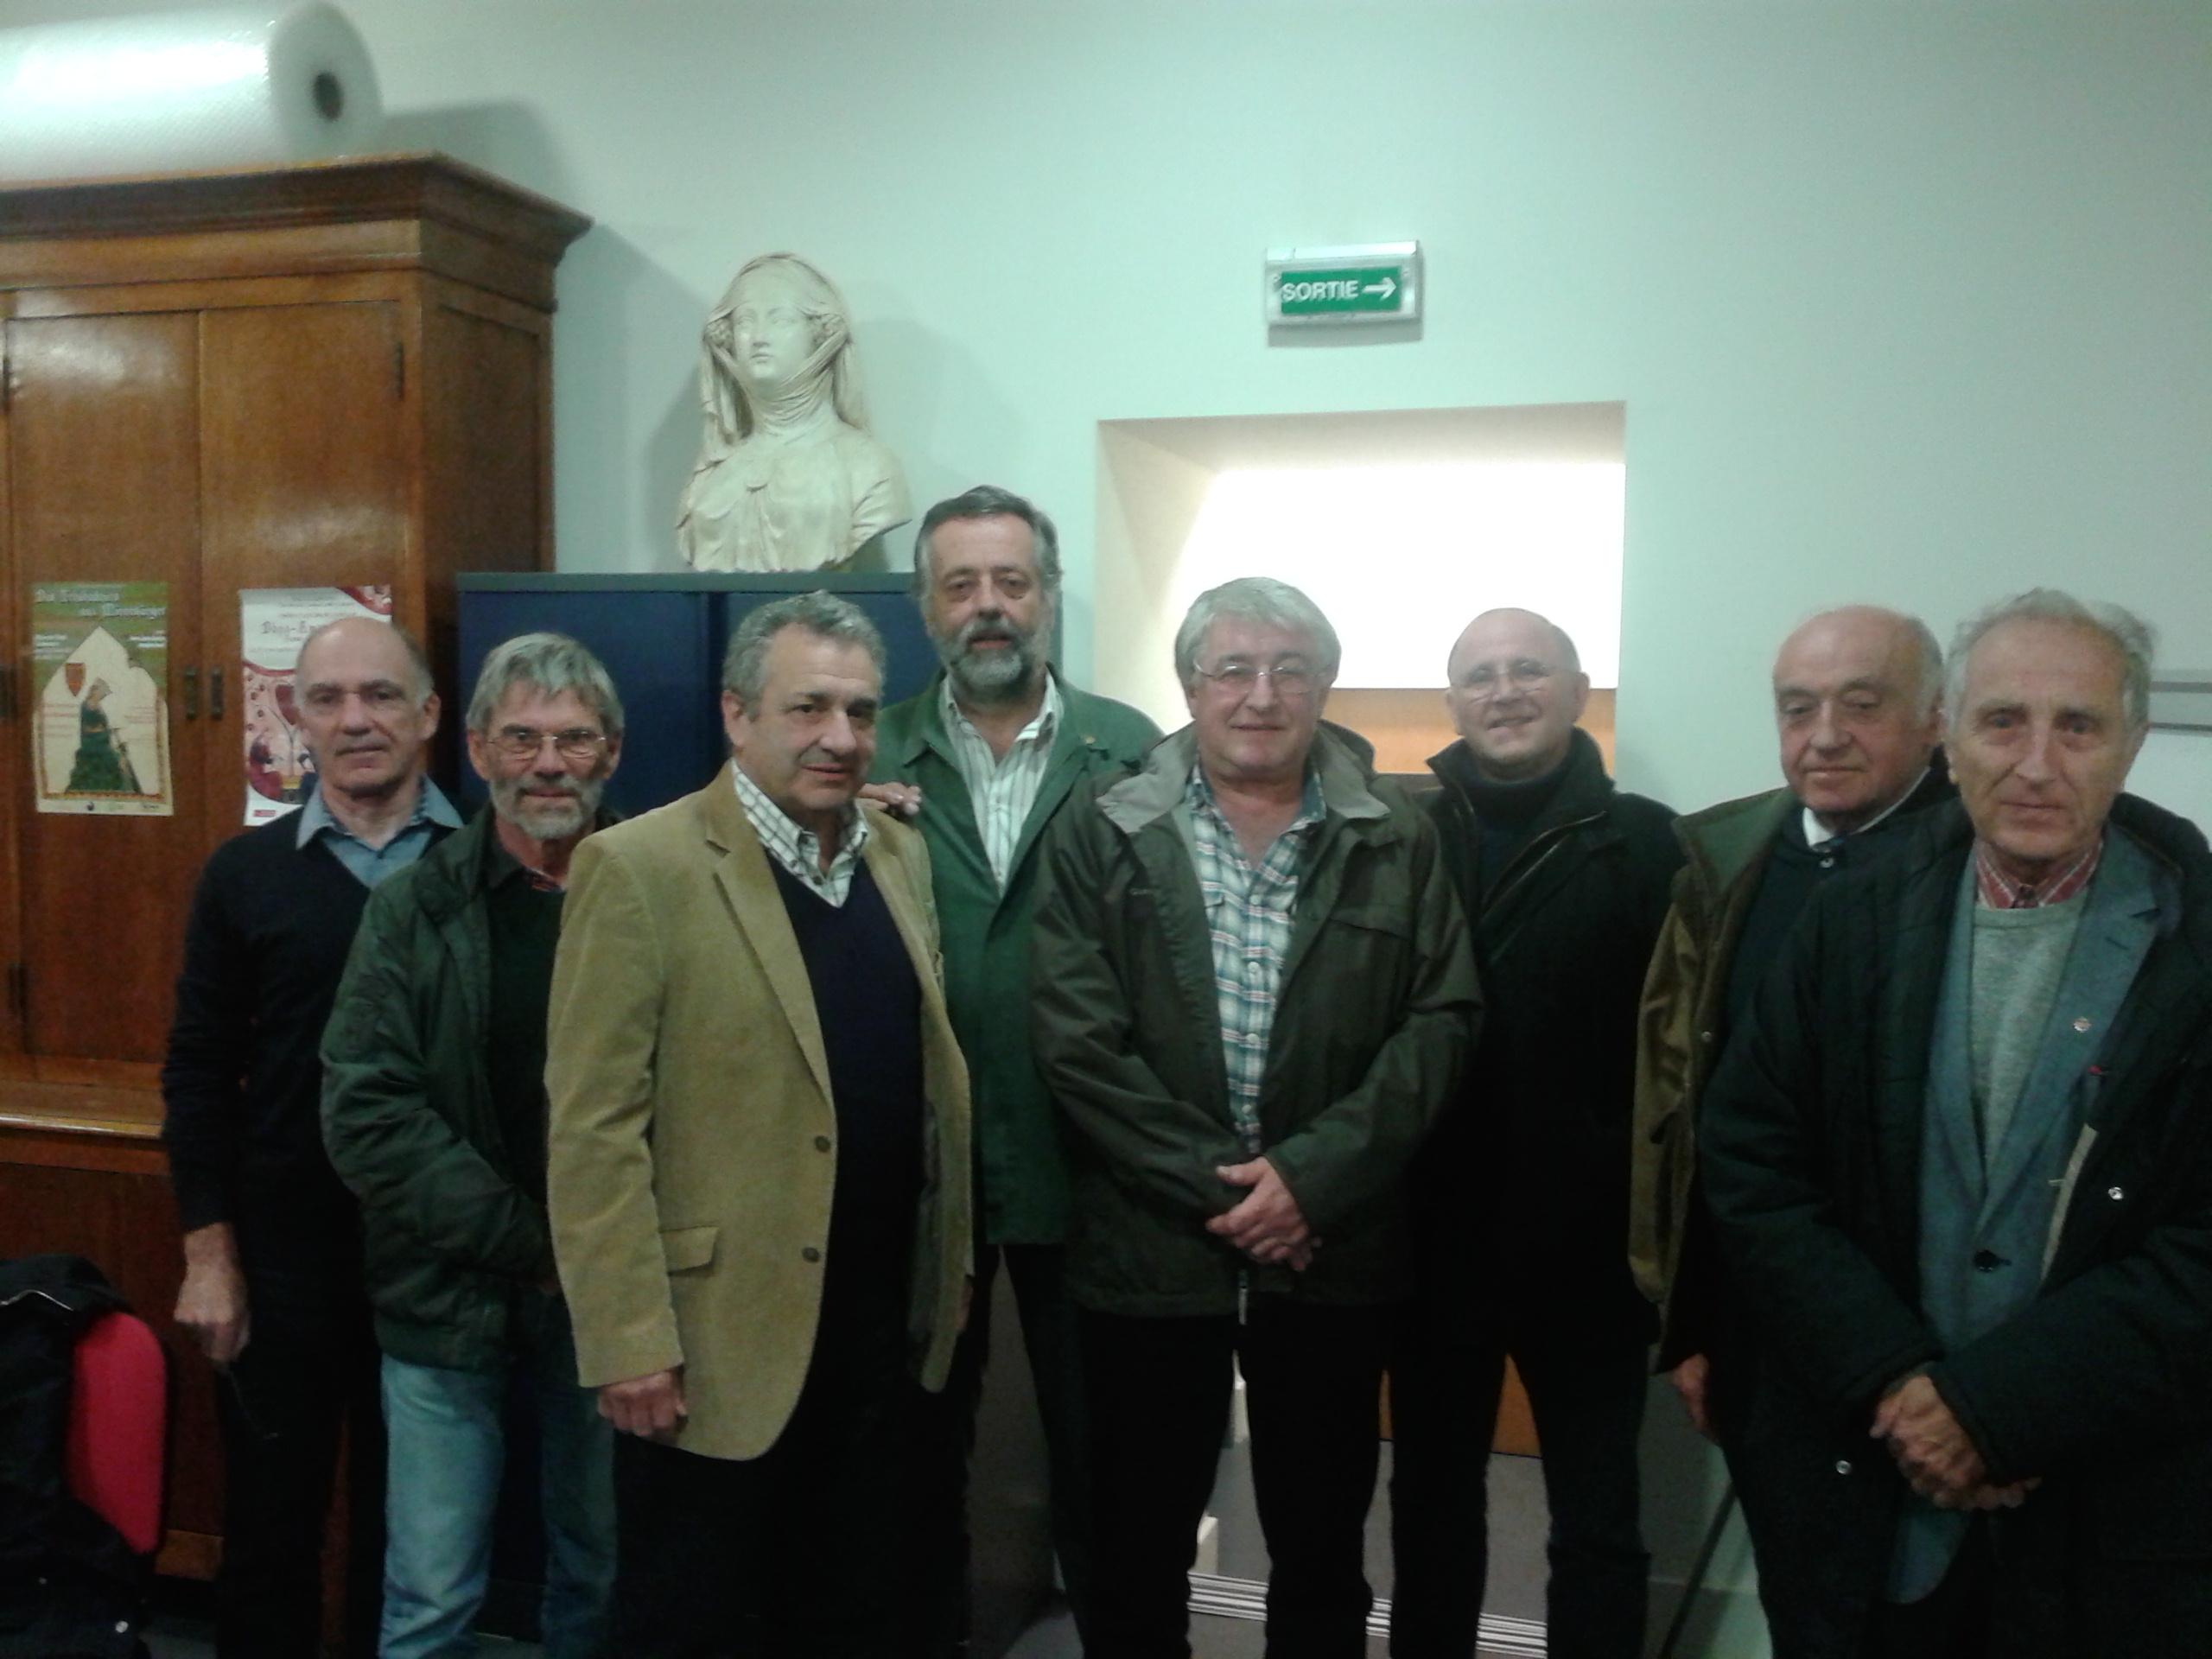 Relacions Entre Era Acadèmia Aranesa Dera Lengua Occitana E Eth Consistòri Deth Gai Saber-Acadèmia Occitana